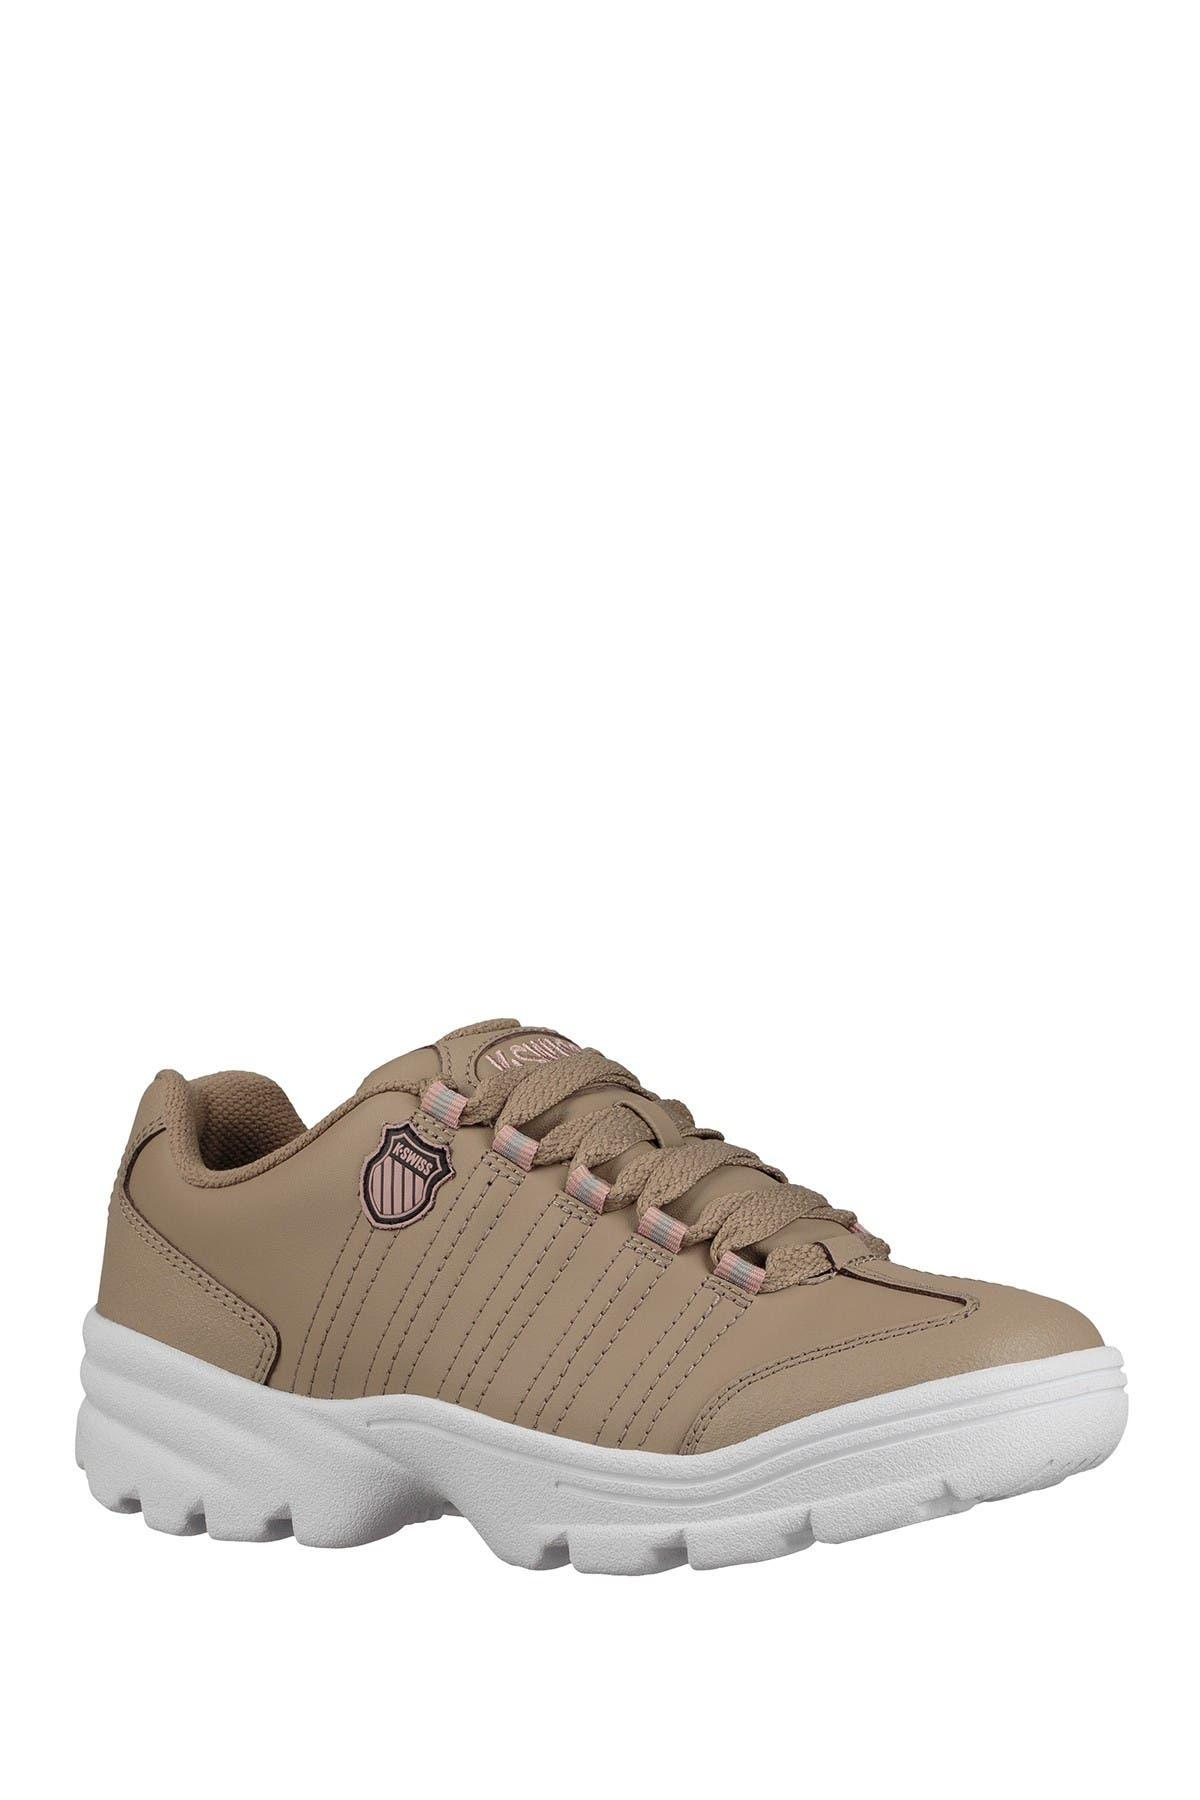 Image of K-Swiss Altezo Thick Tread Sneaker